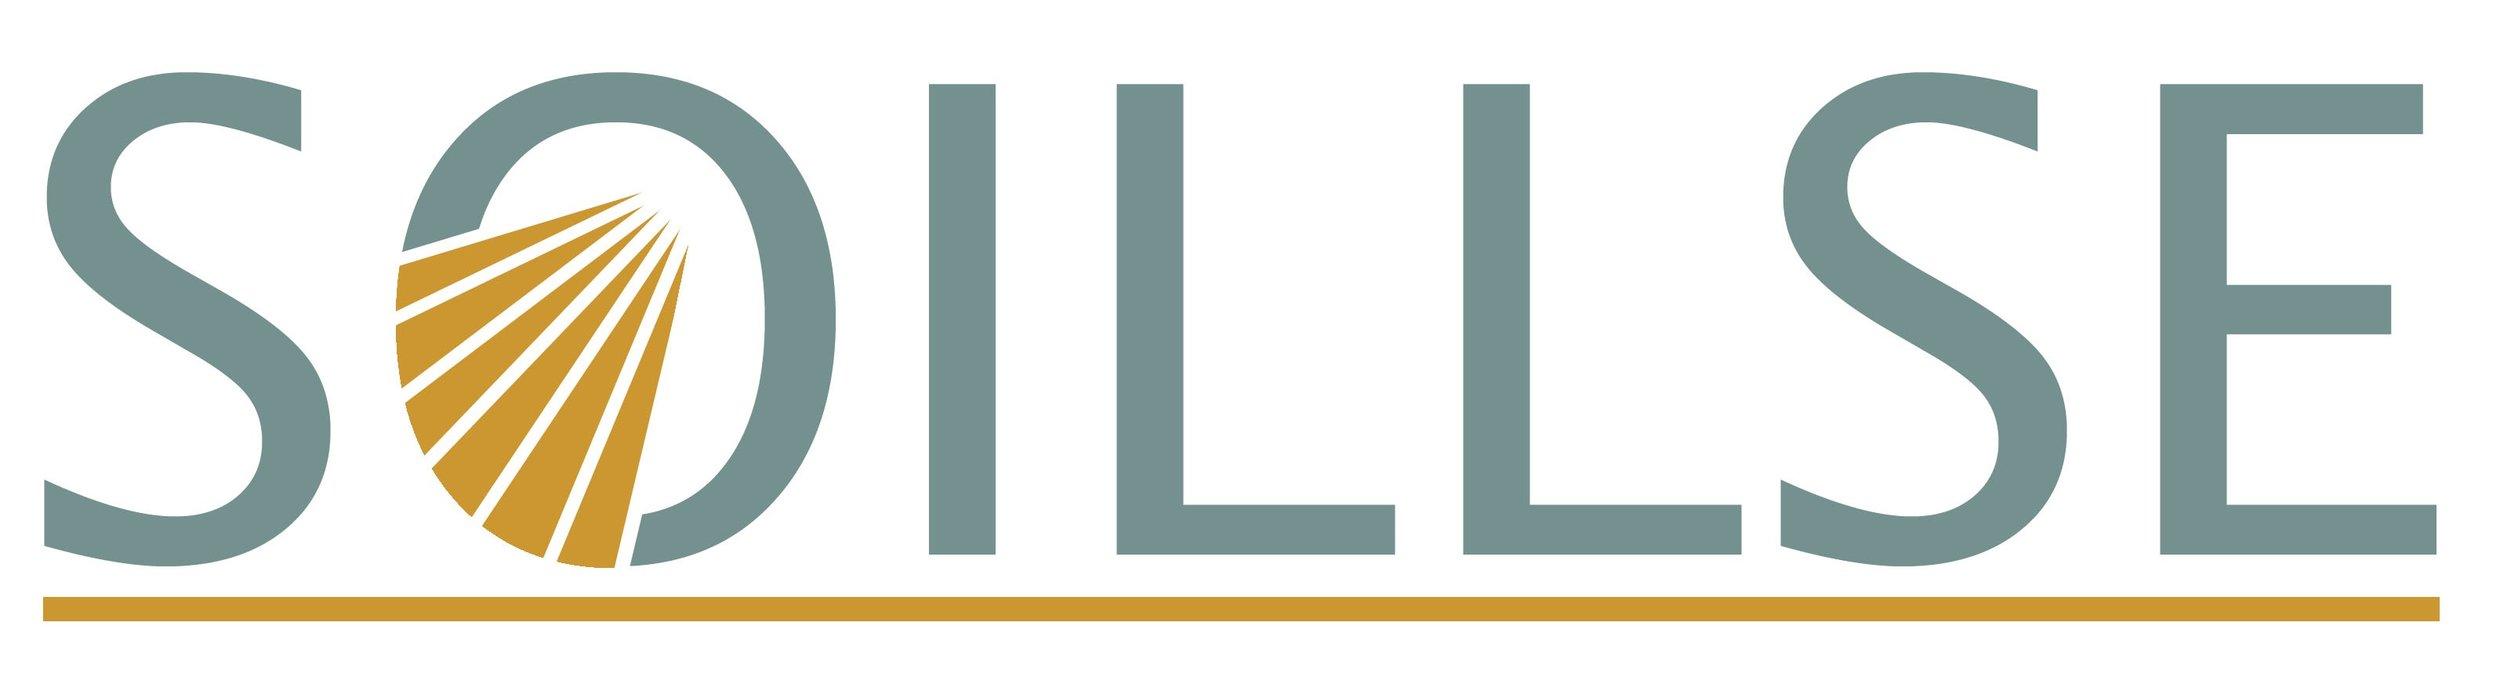 Soillse logo (Gaelic Language and Culture)